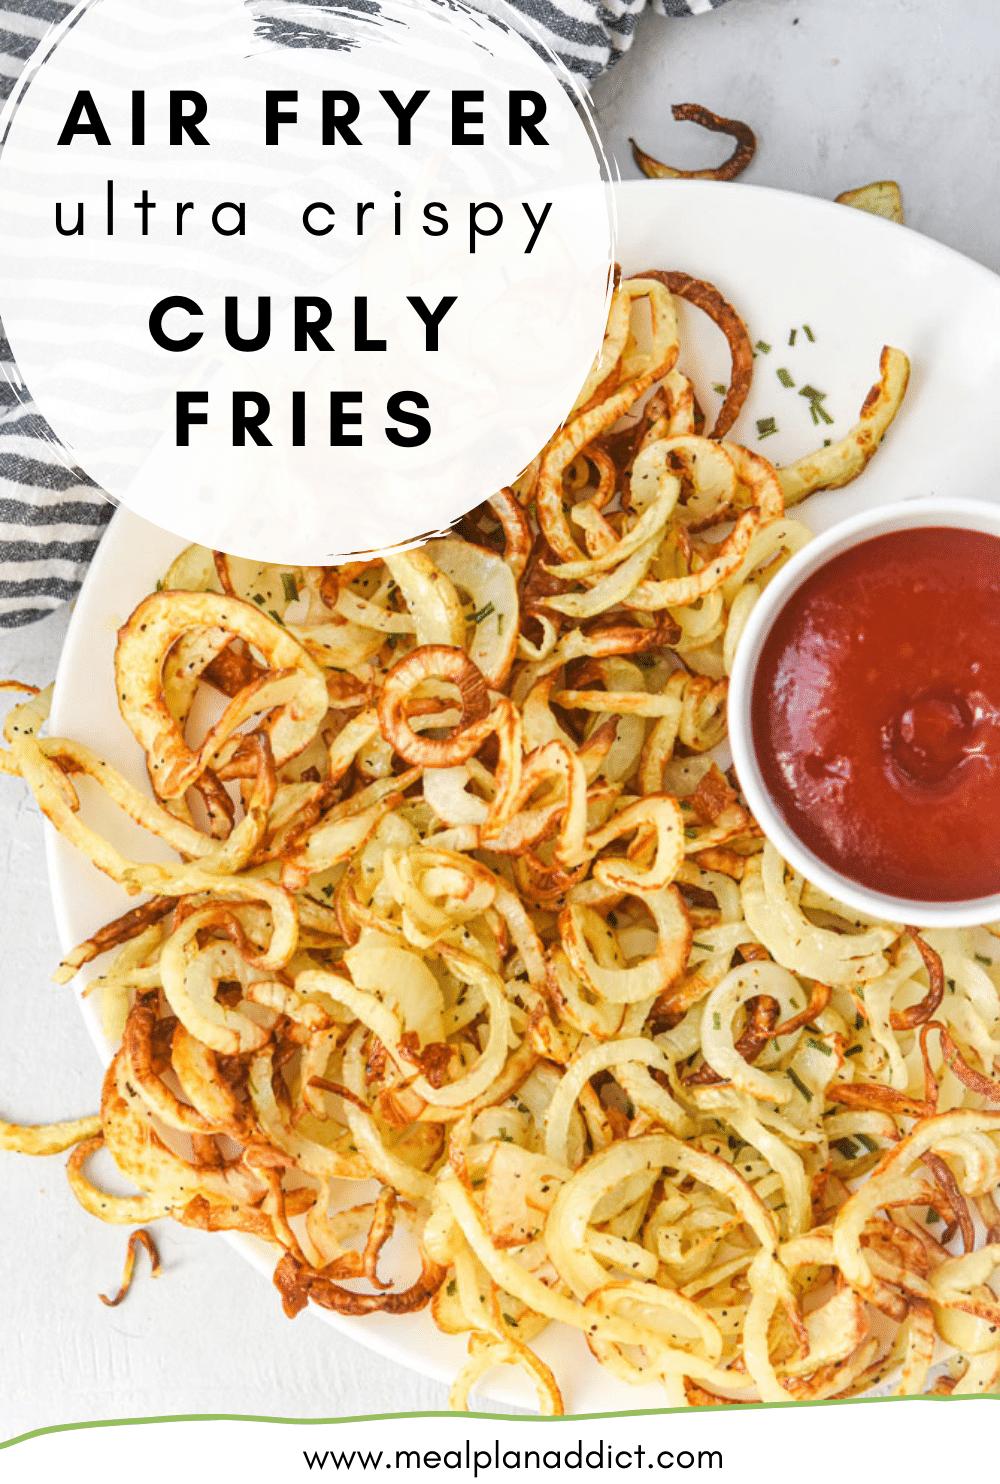 air fryer ultra crispy curly fries